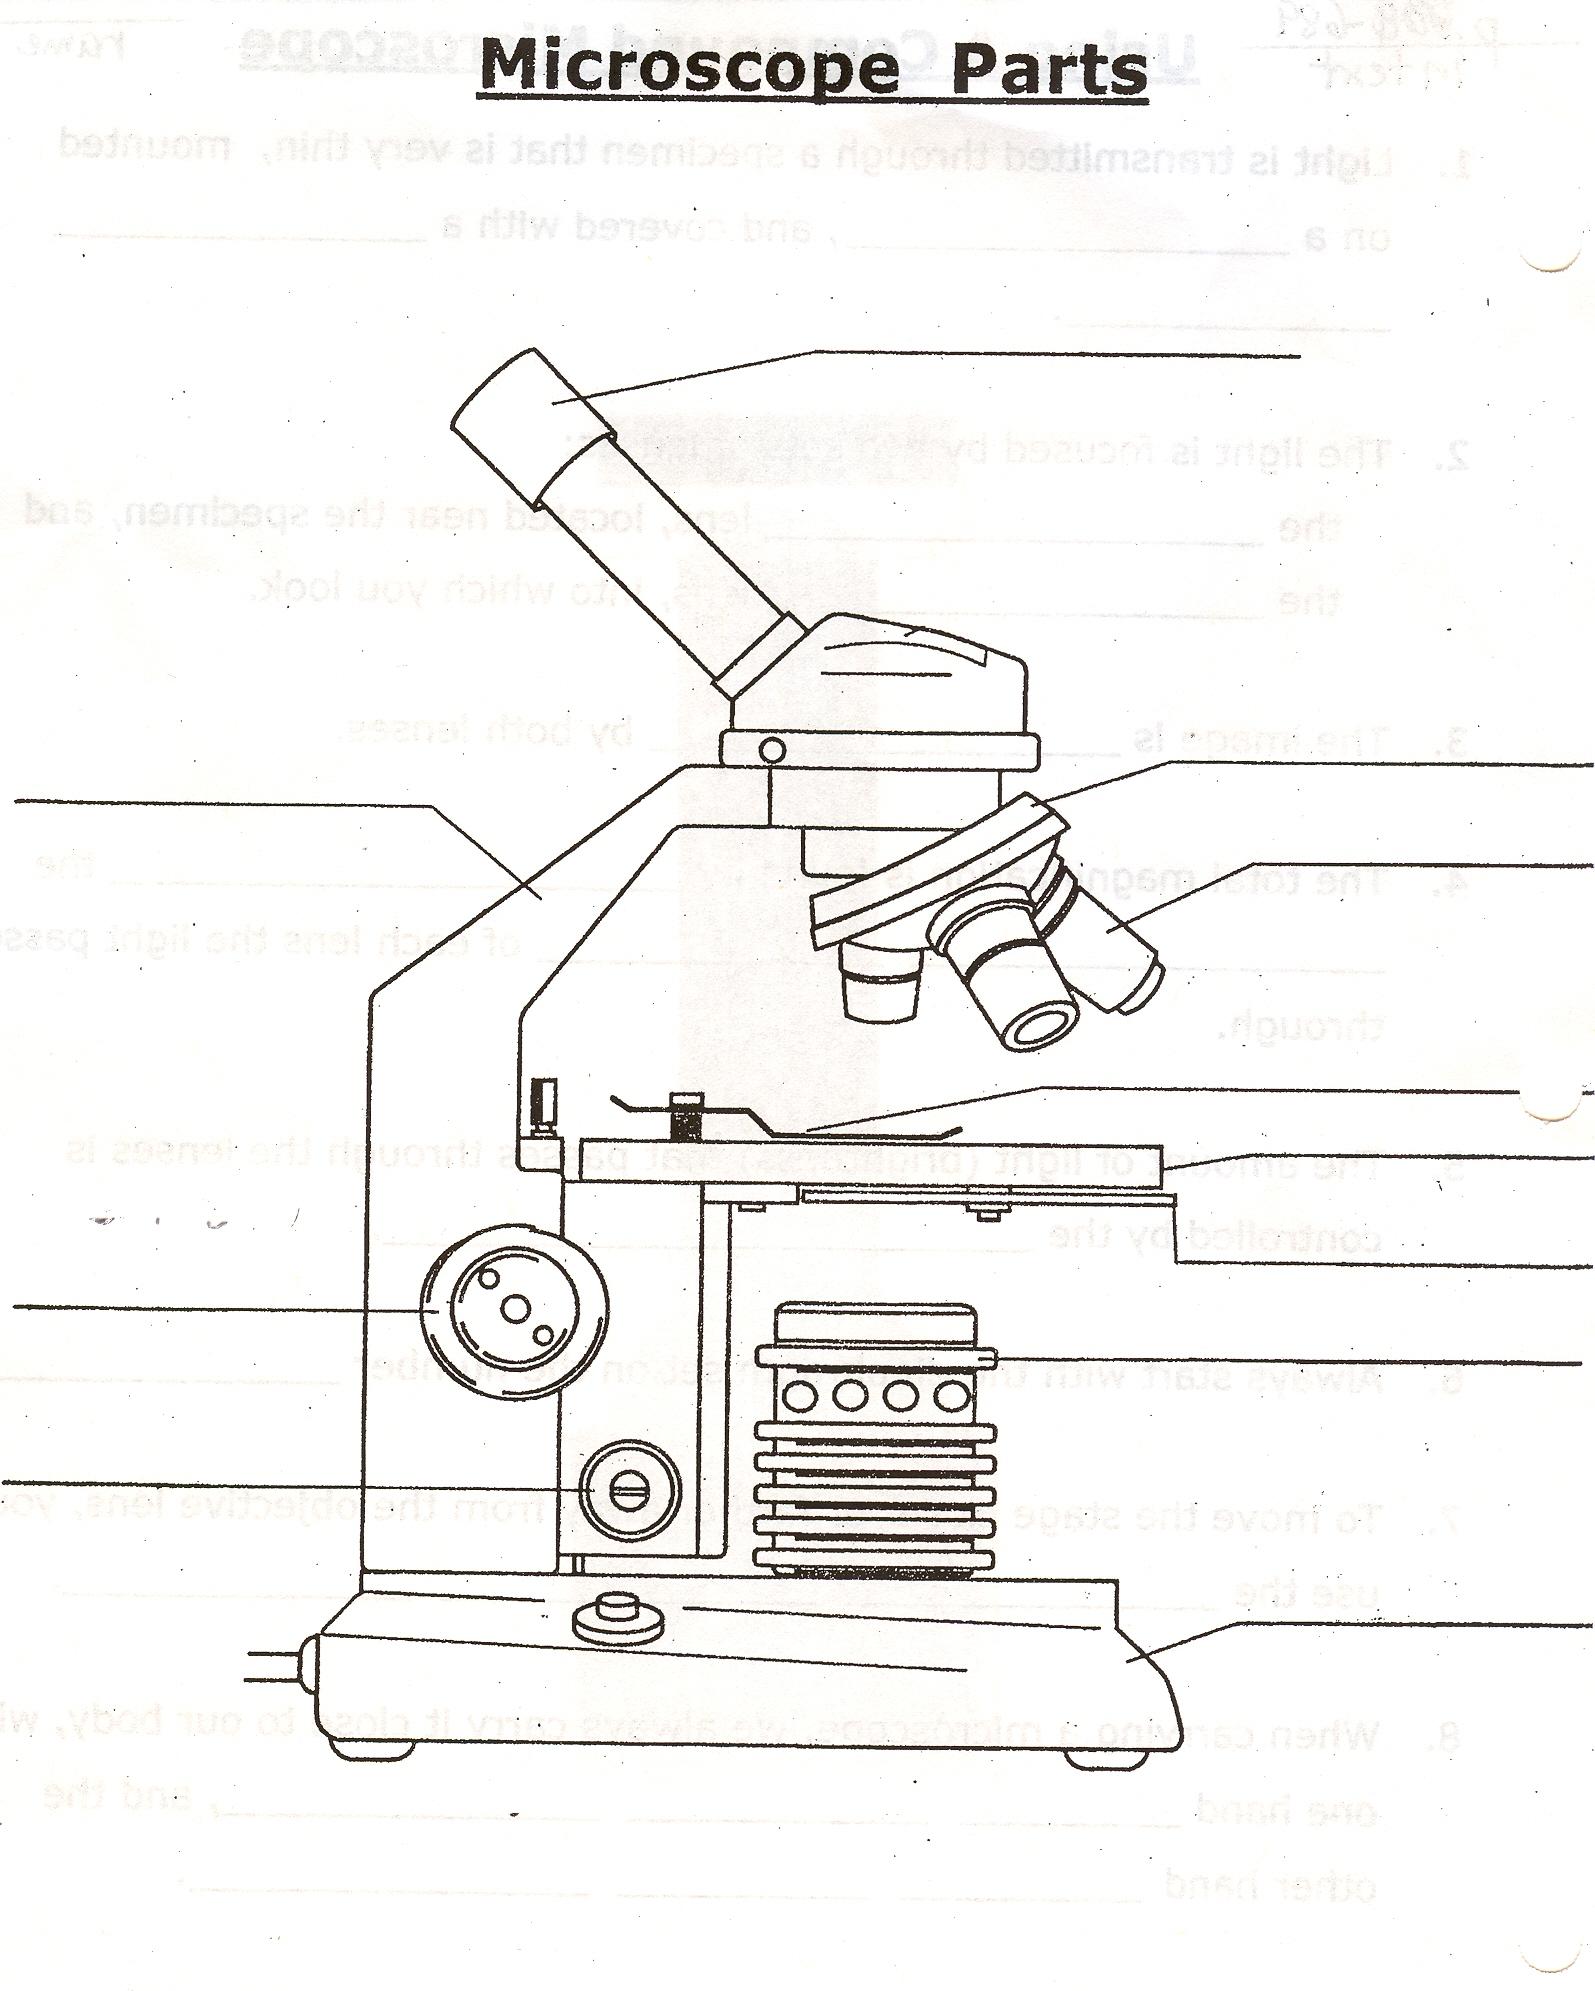 microscope diagram unlabeled apexi vafc2 wiring worksheet parts grass fedjp